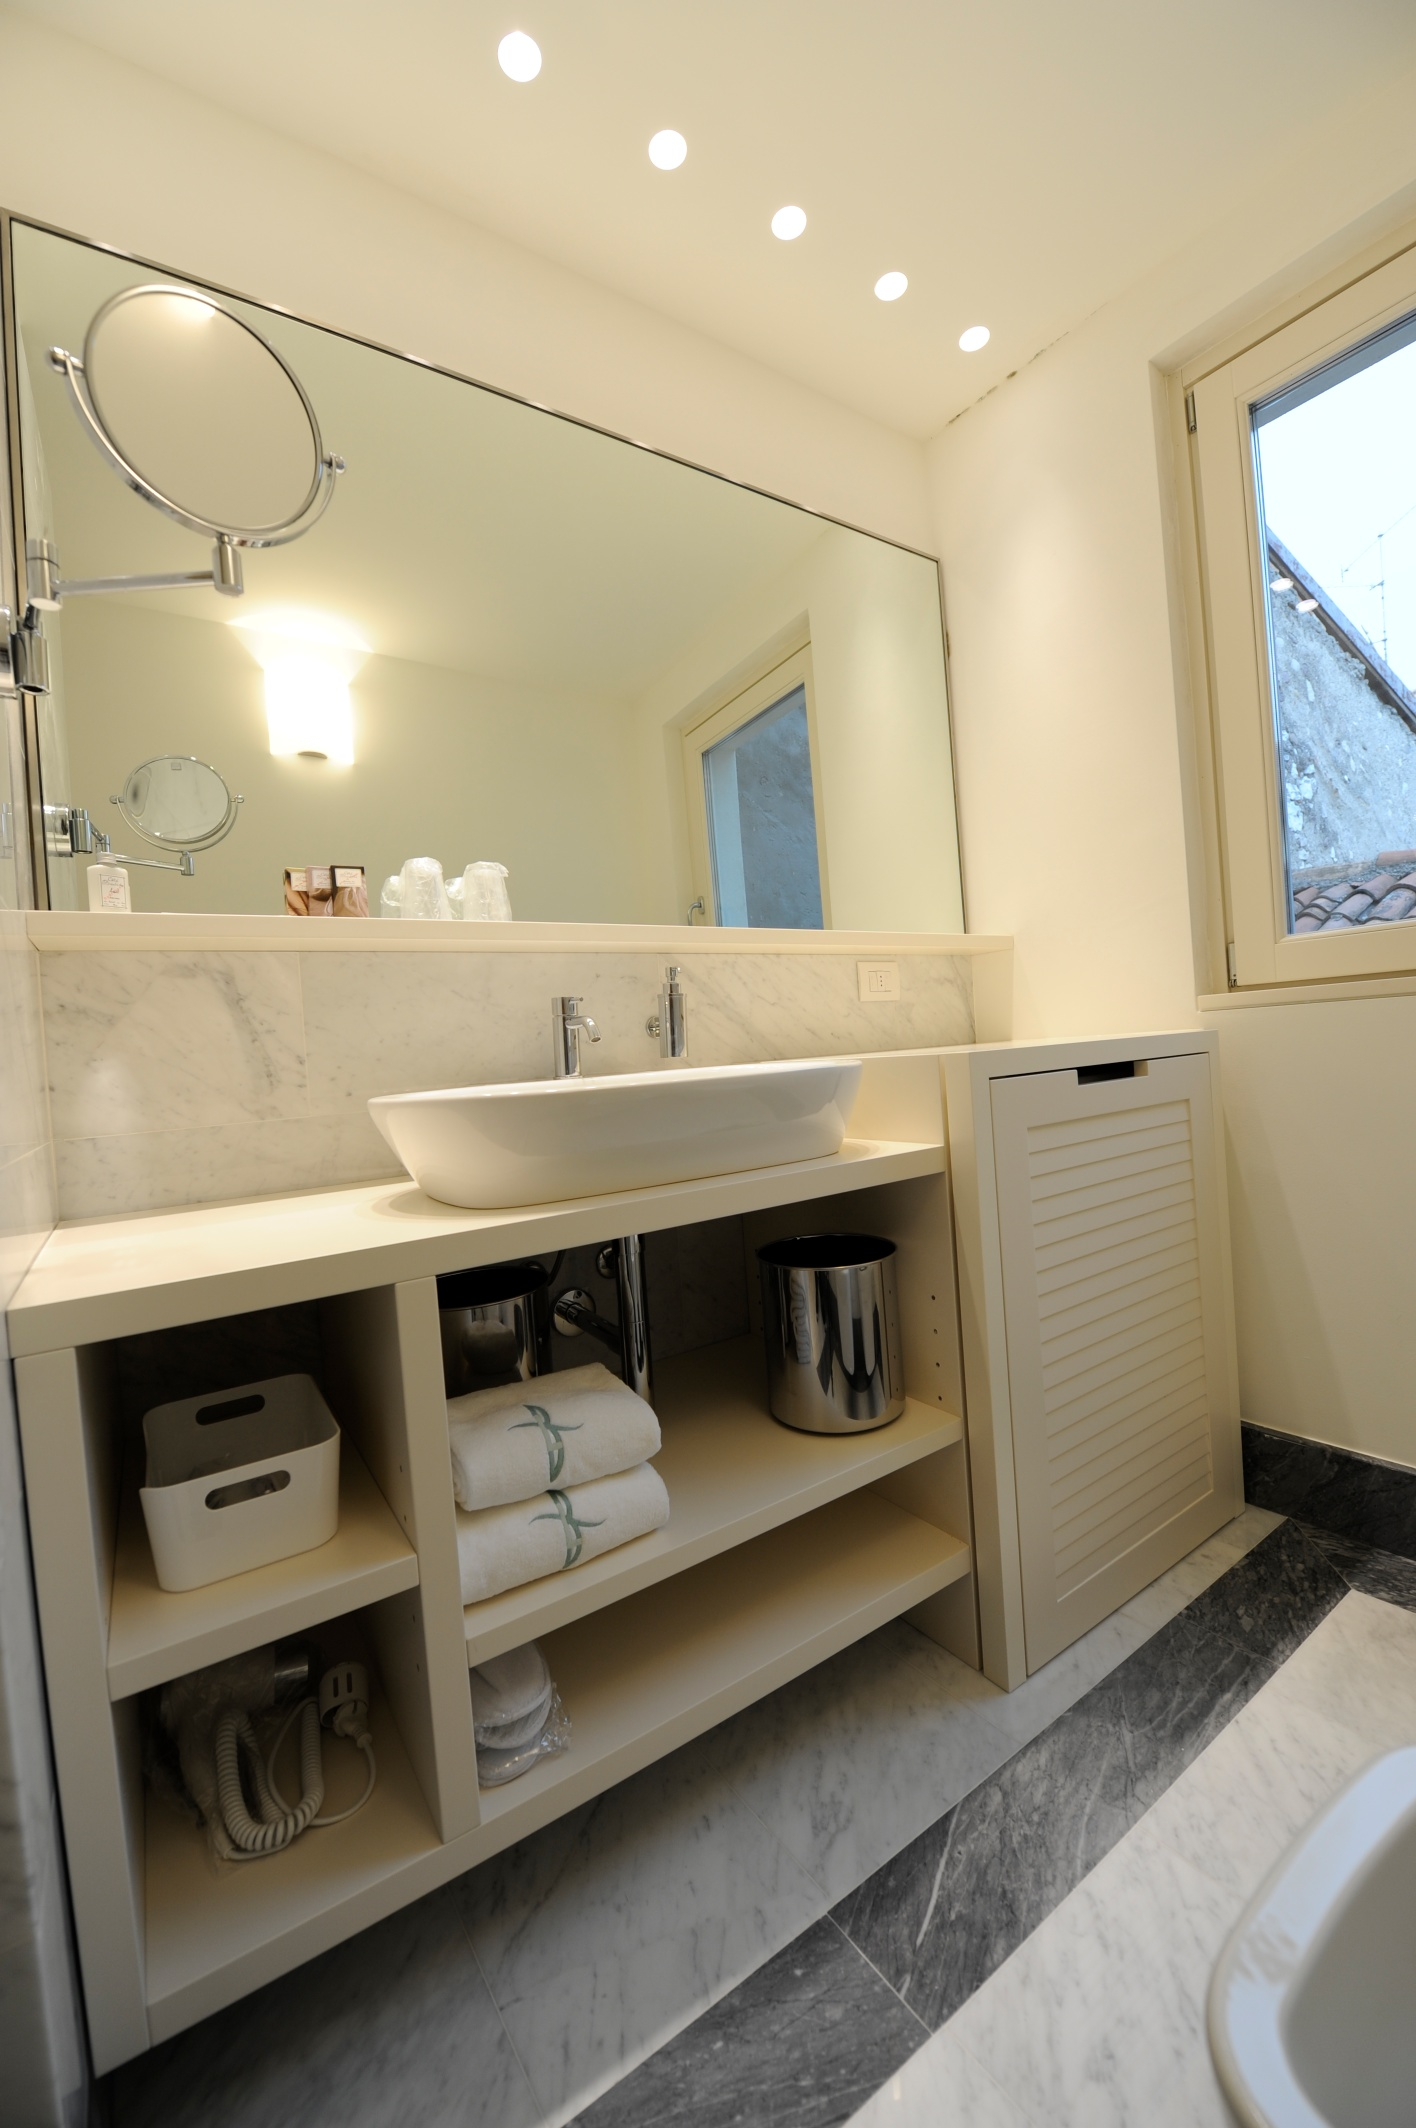 mobili incasso lavatrice bagno | sweetwaterrescue - Arredo Bagno Lavatrice Incasso